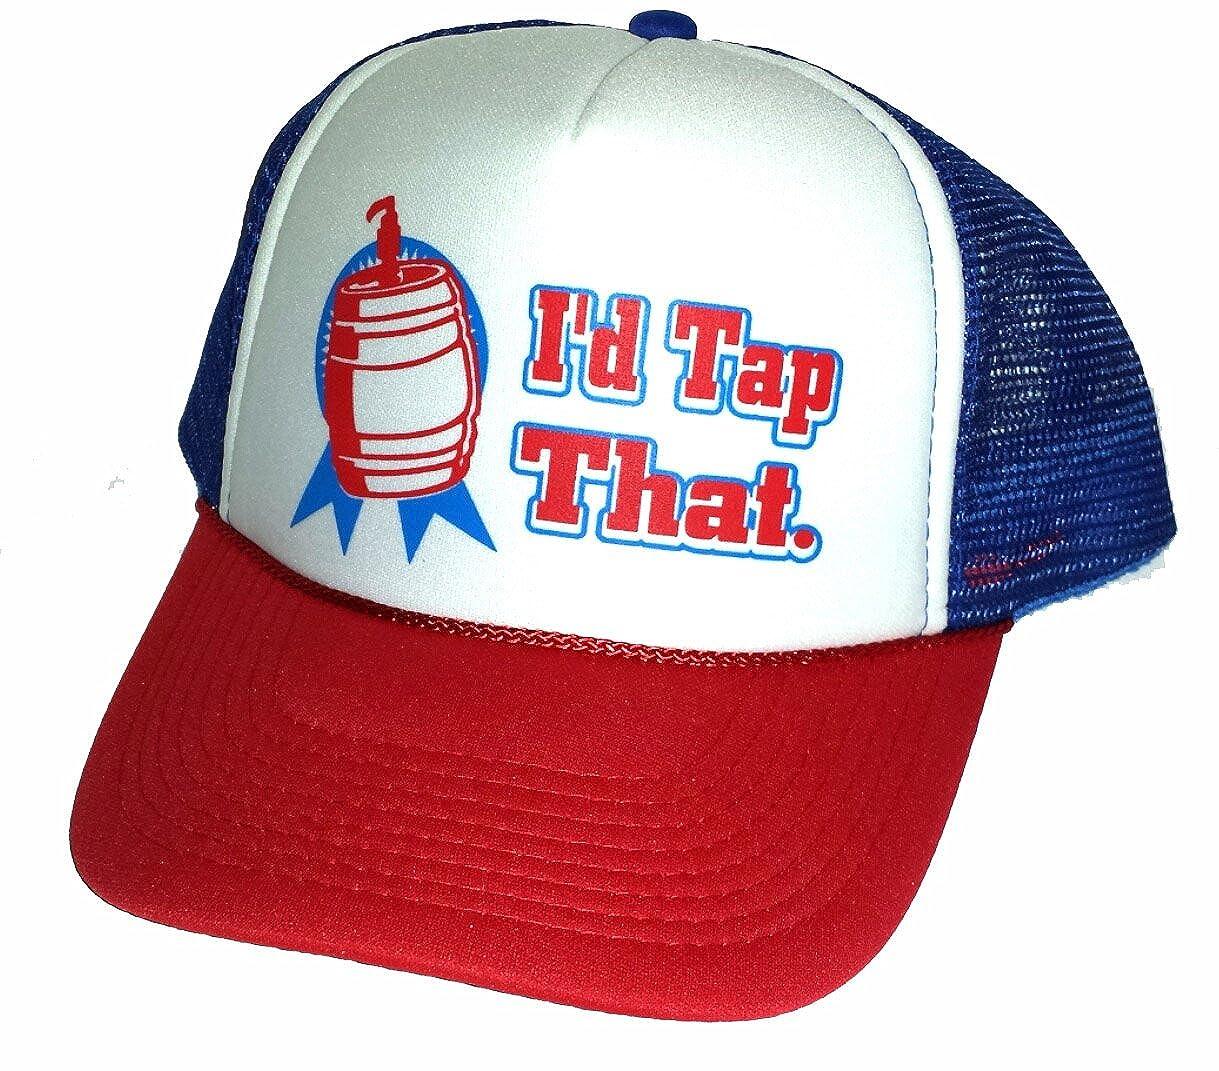 I'd Tap That Keg Mesh Trucker Hat Cap Snapback Beer